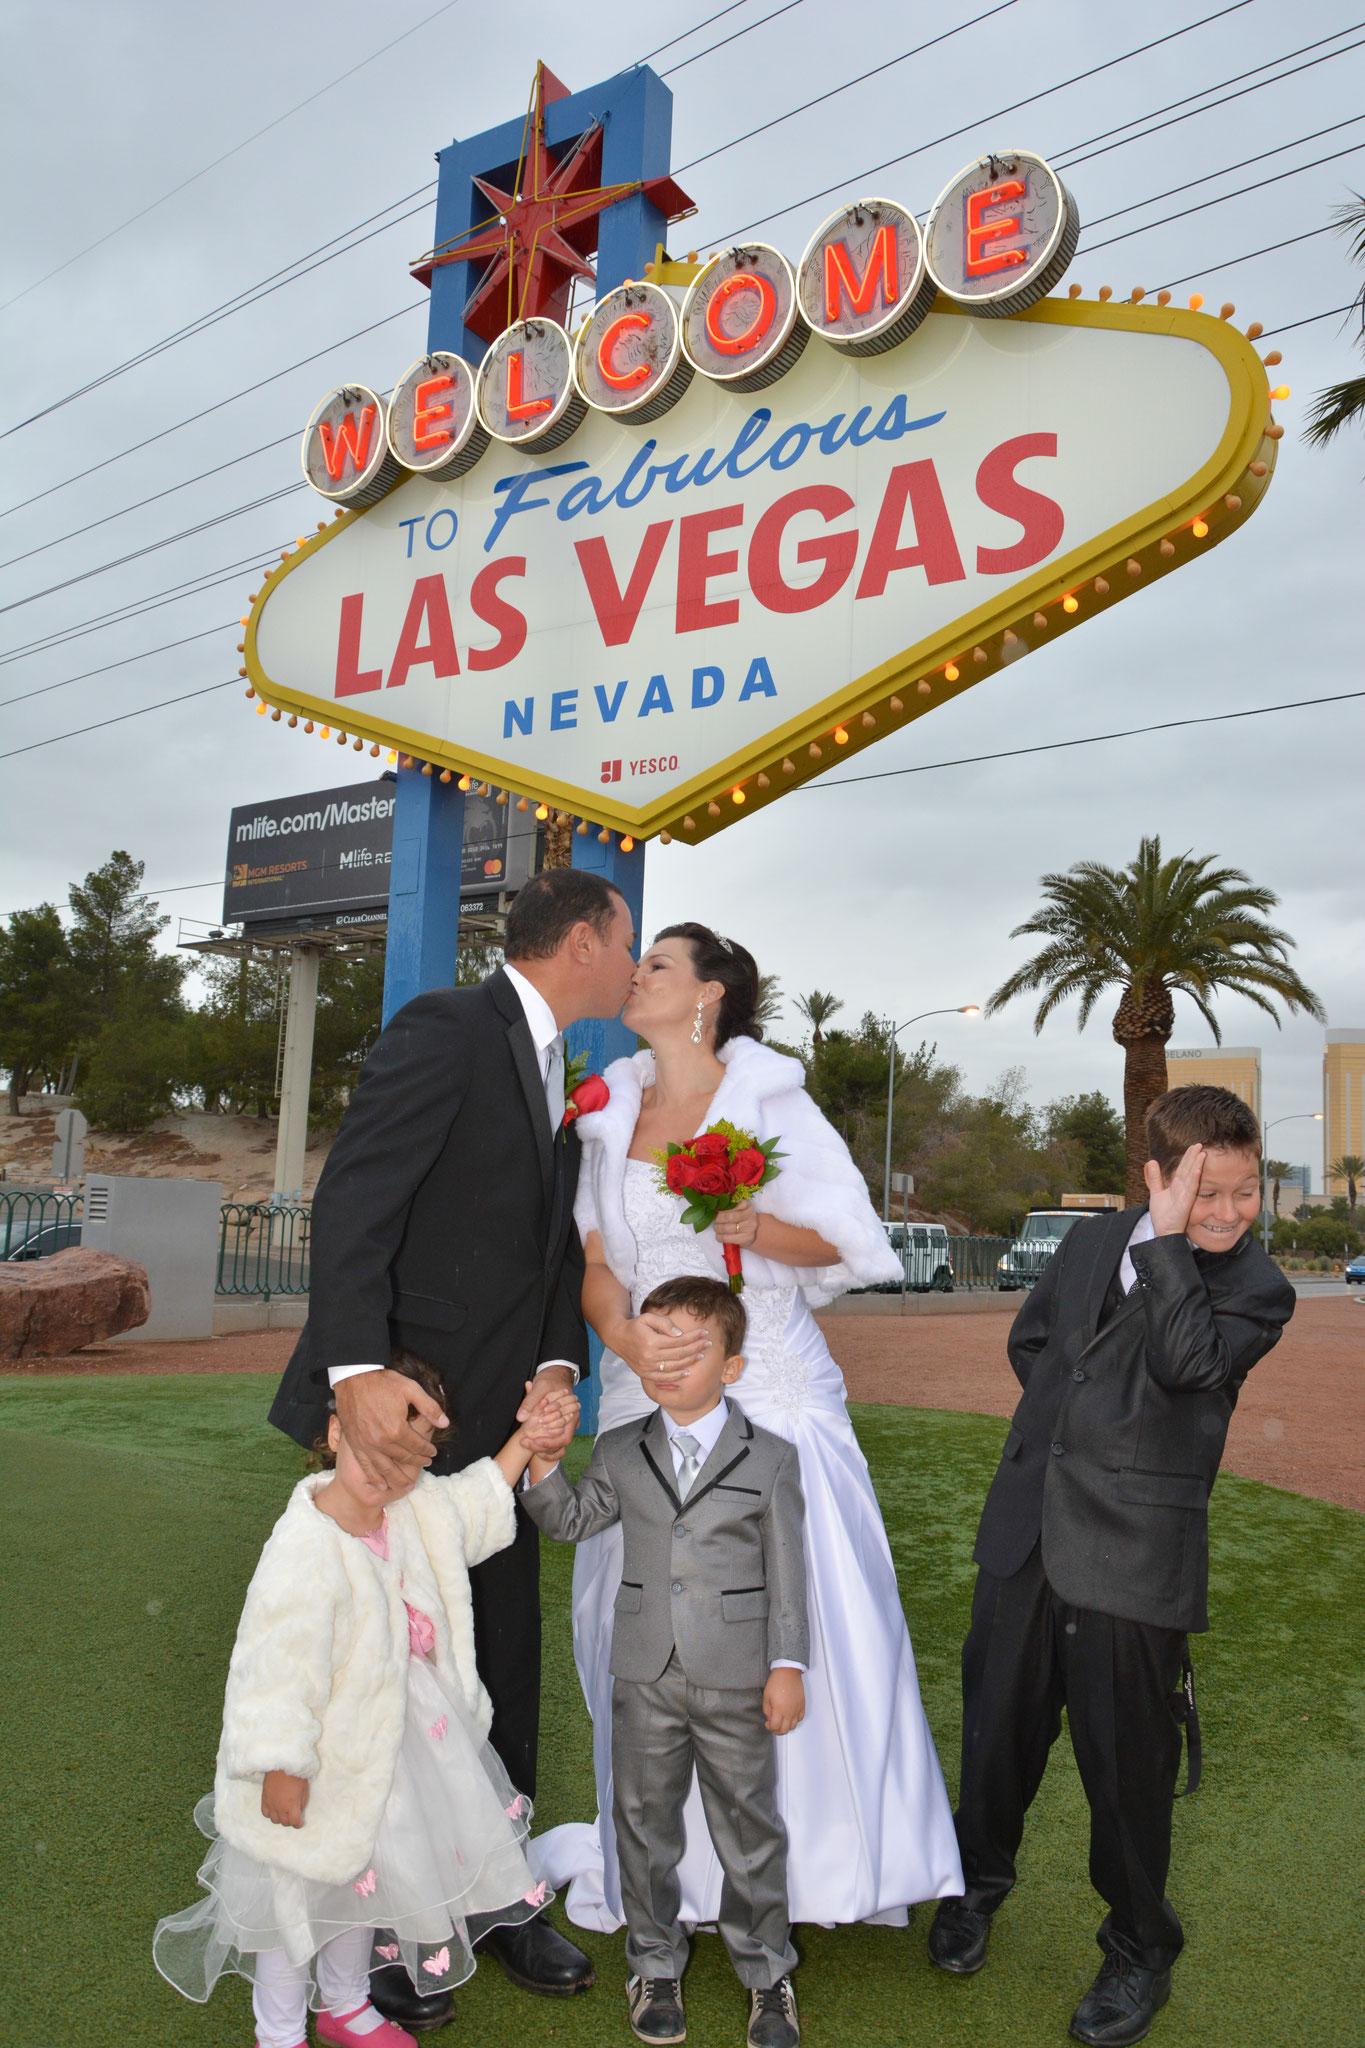 Welcome to Las Vegas Sign mit der Familie